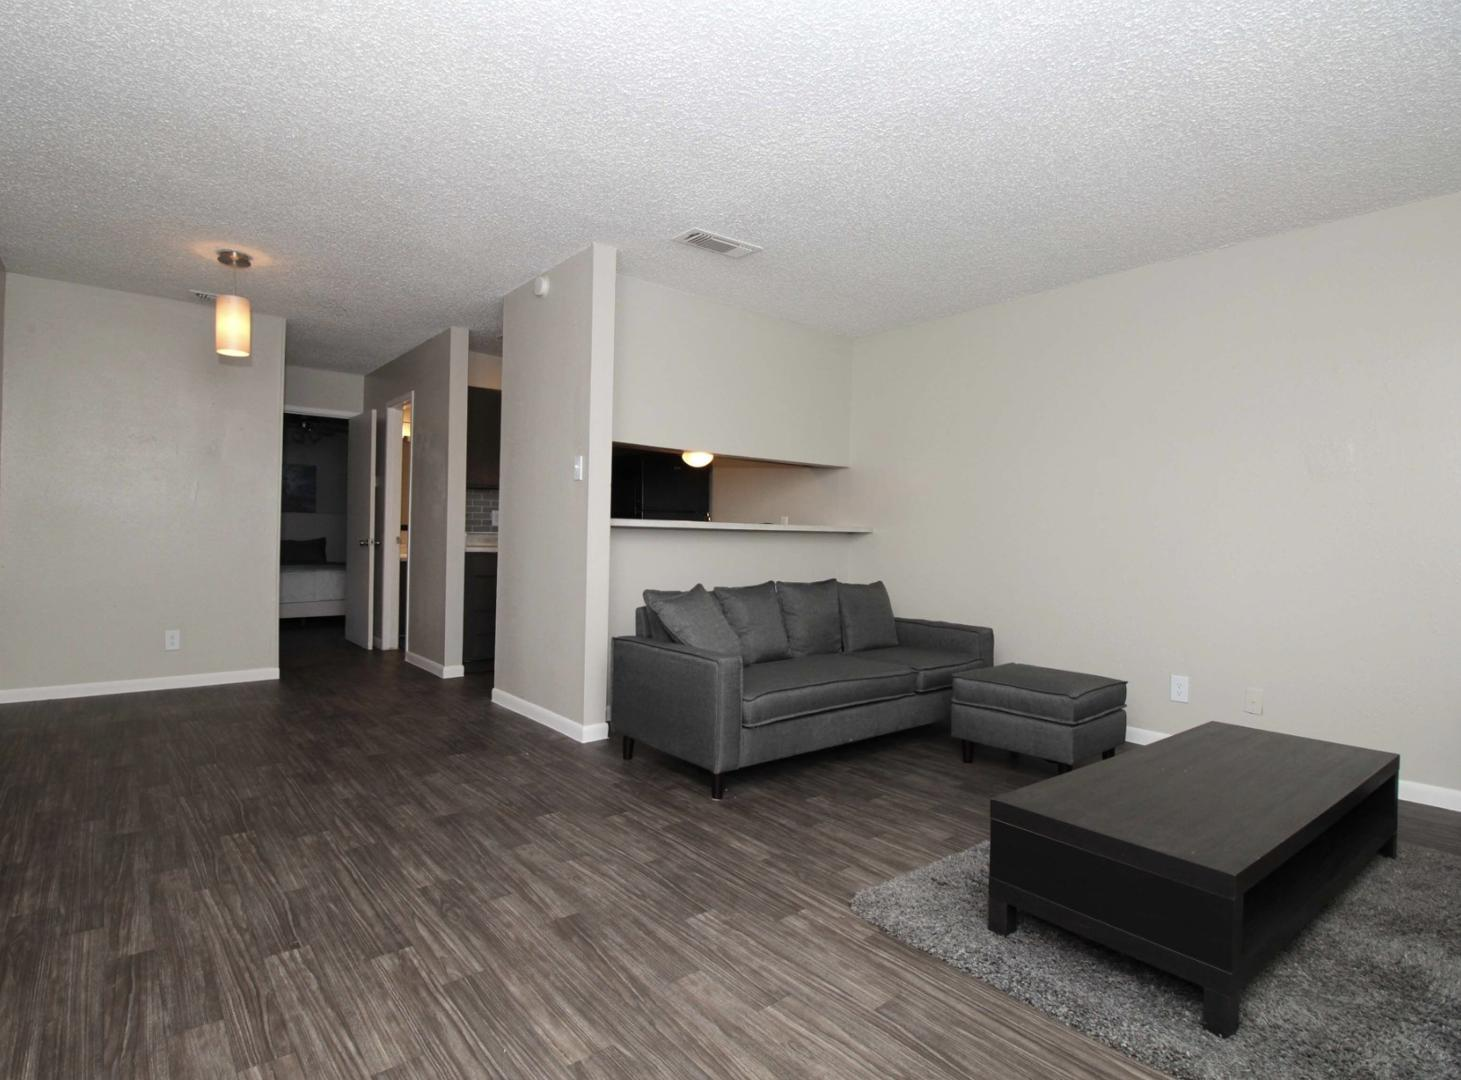 7810 Callaghan Road #2808, San Antonio, TX - 729 USD/ month